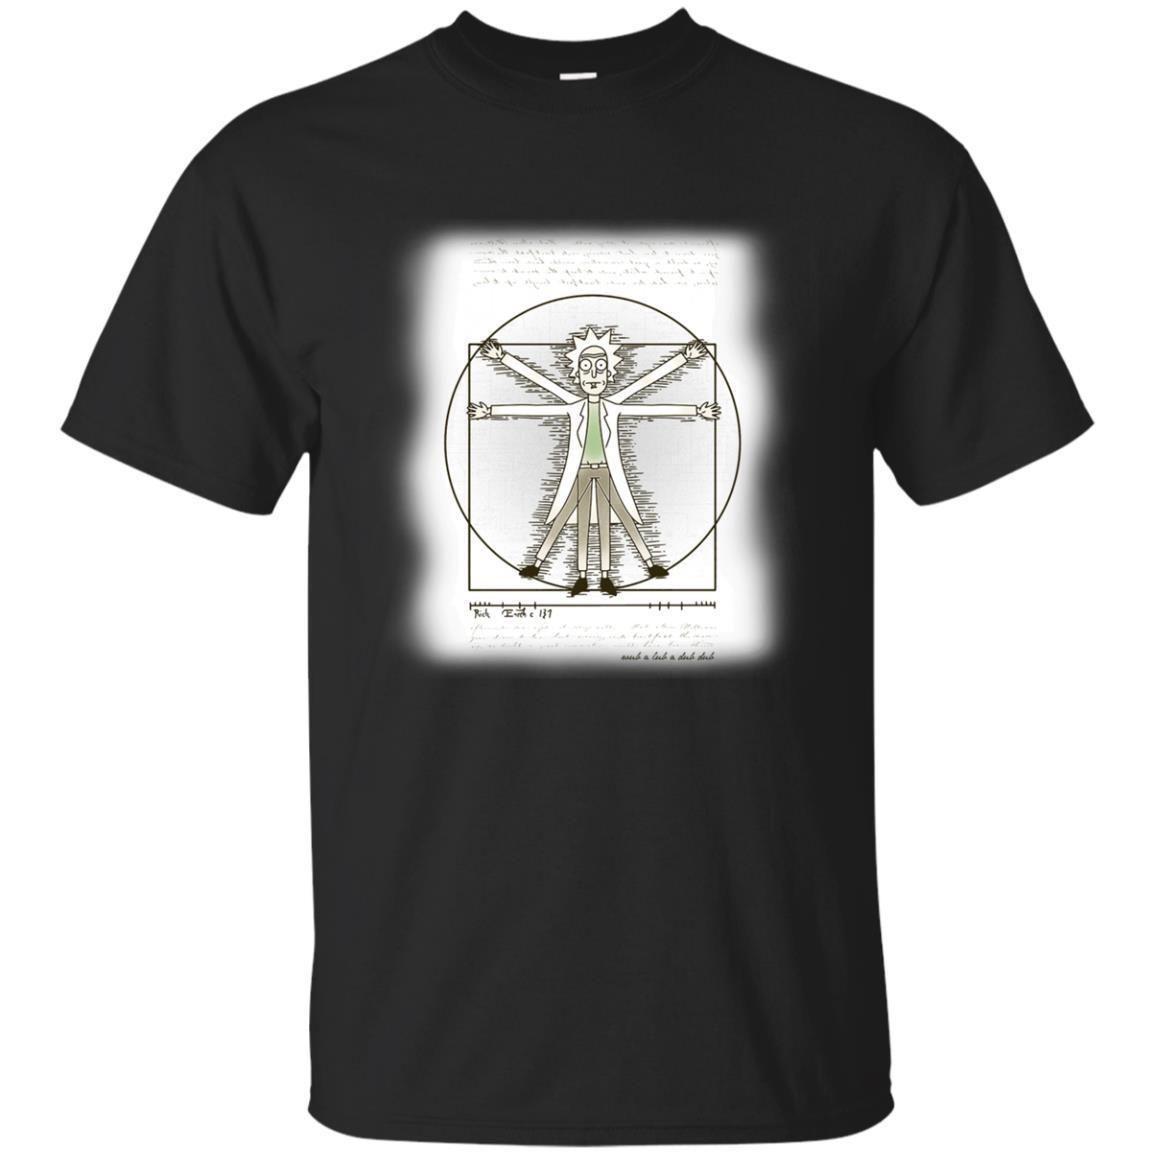 8d08617dc771 Donnie Darko Bob s Burgers Shirt